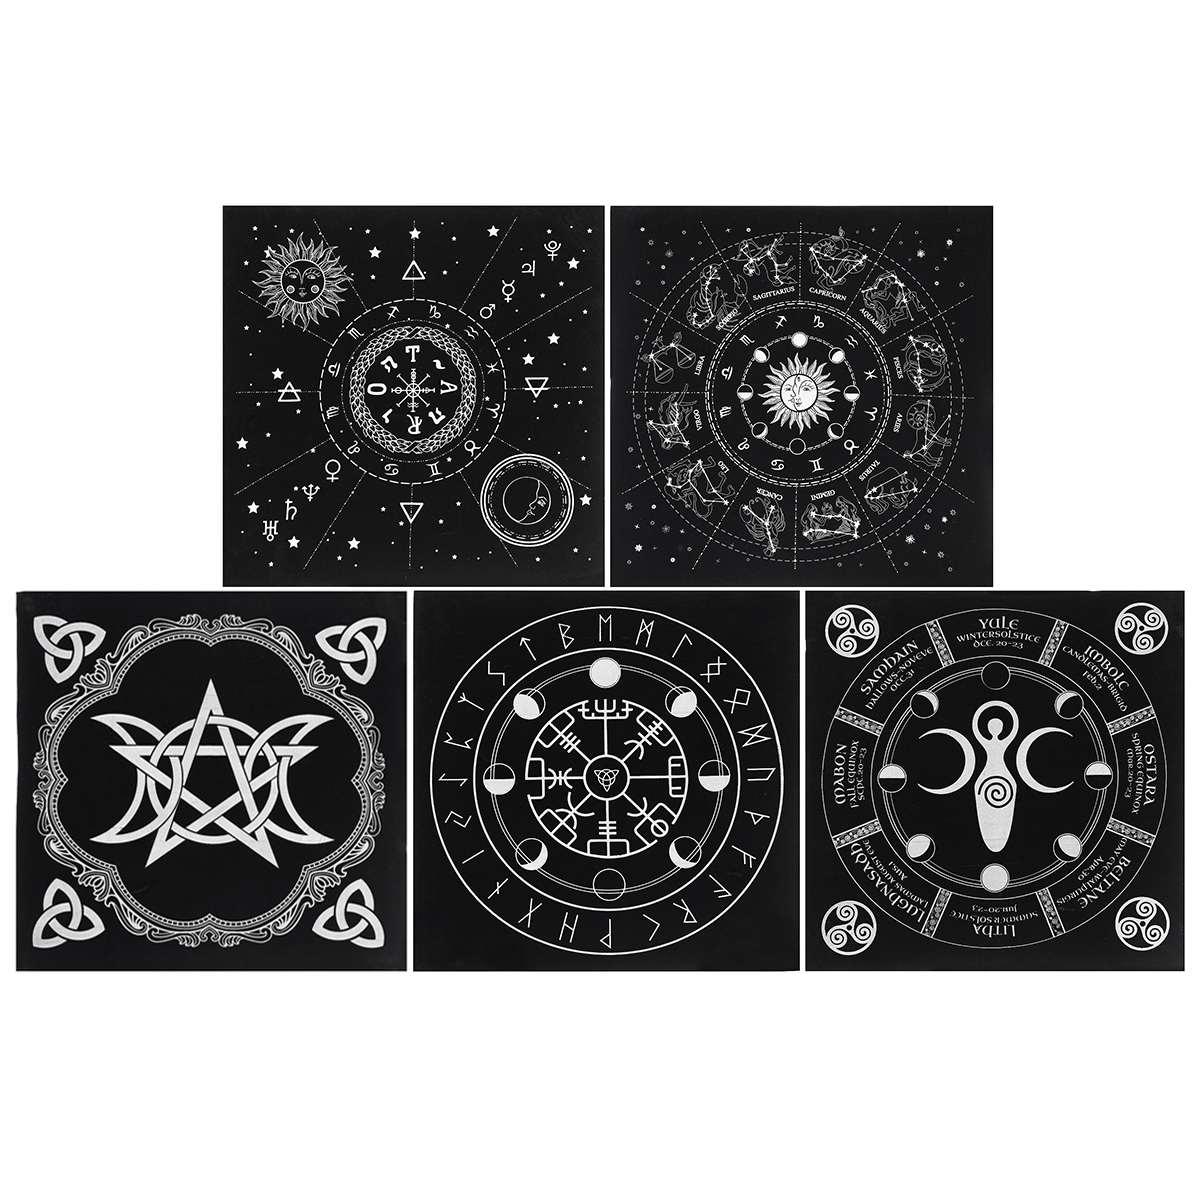 5 Types 49x49cm Tarot Tablecloth Triple Moon Pentagram Pagan Altar Tarot Cloth Velvet Black